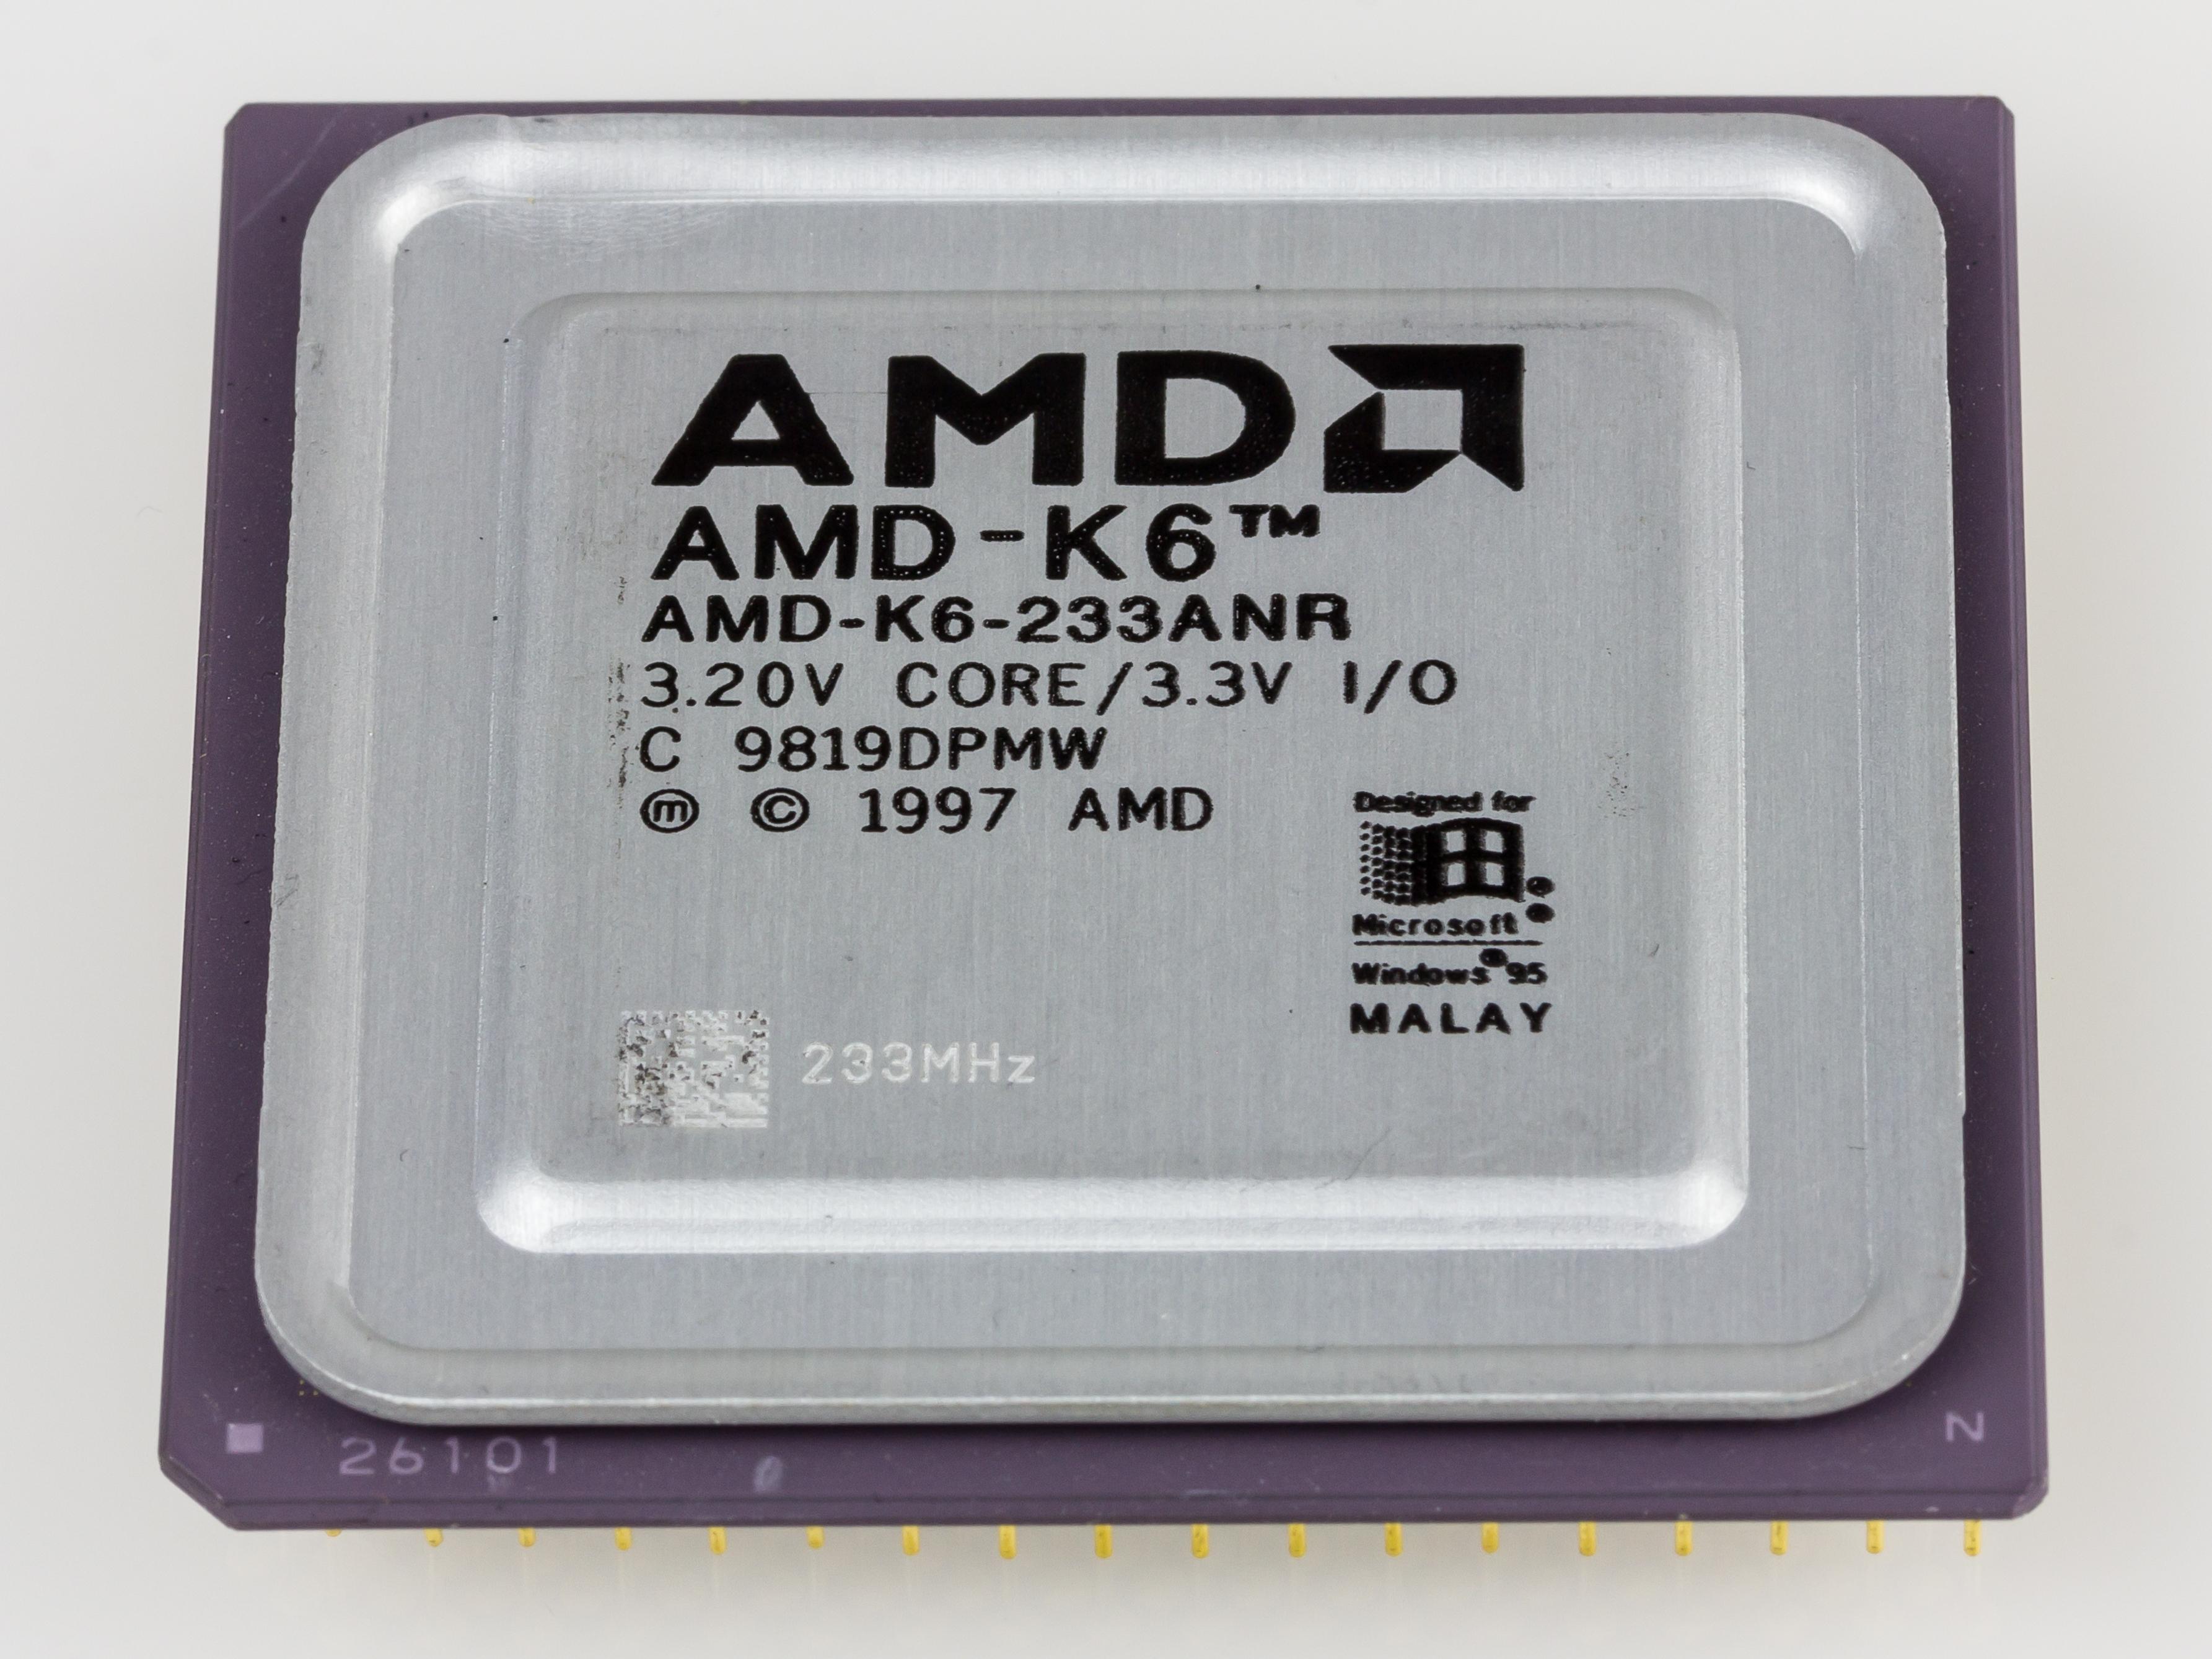 File:AMD-K6-233ANR-2414 jpg - Wikimedia Commons